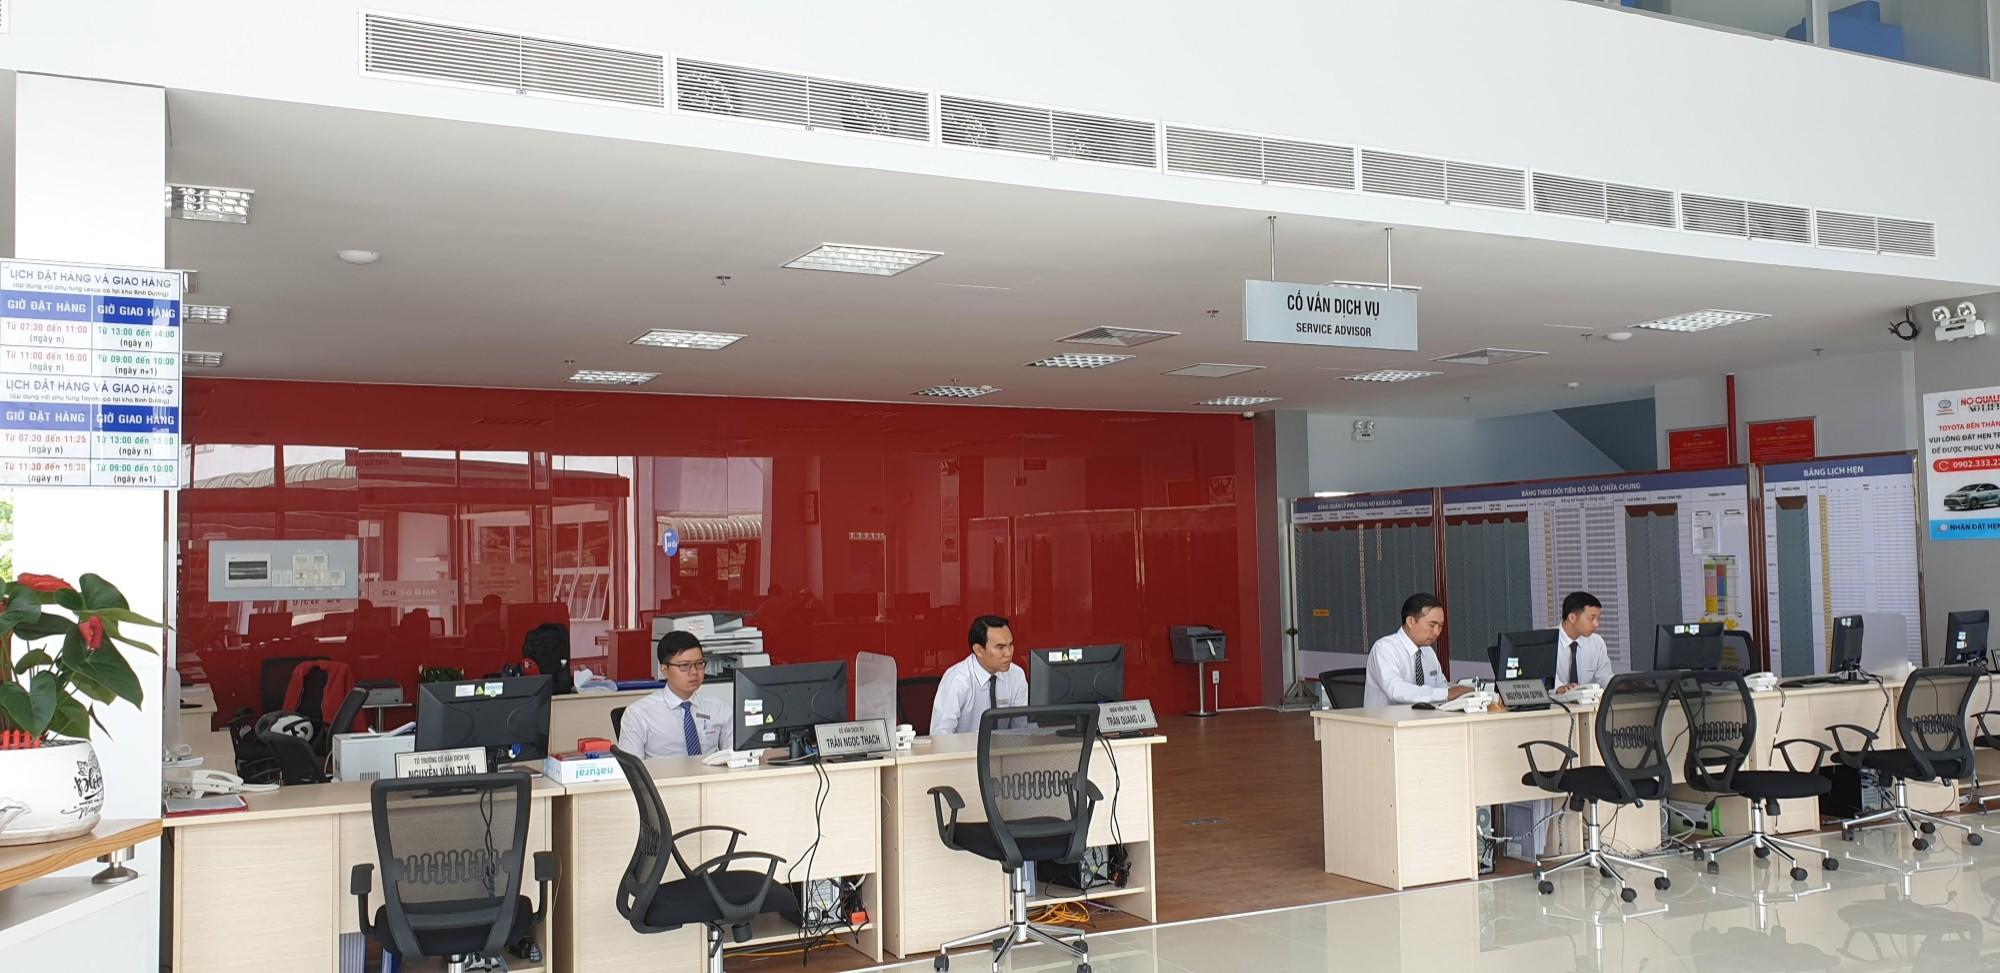 service-advisor-area.jpg